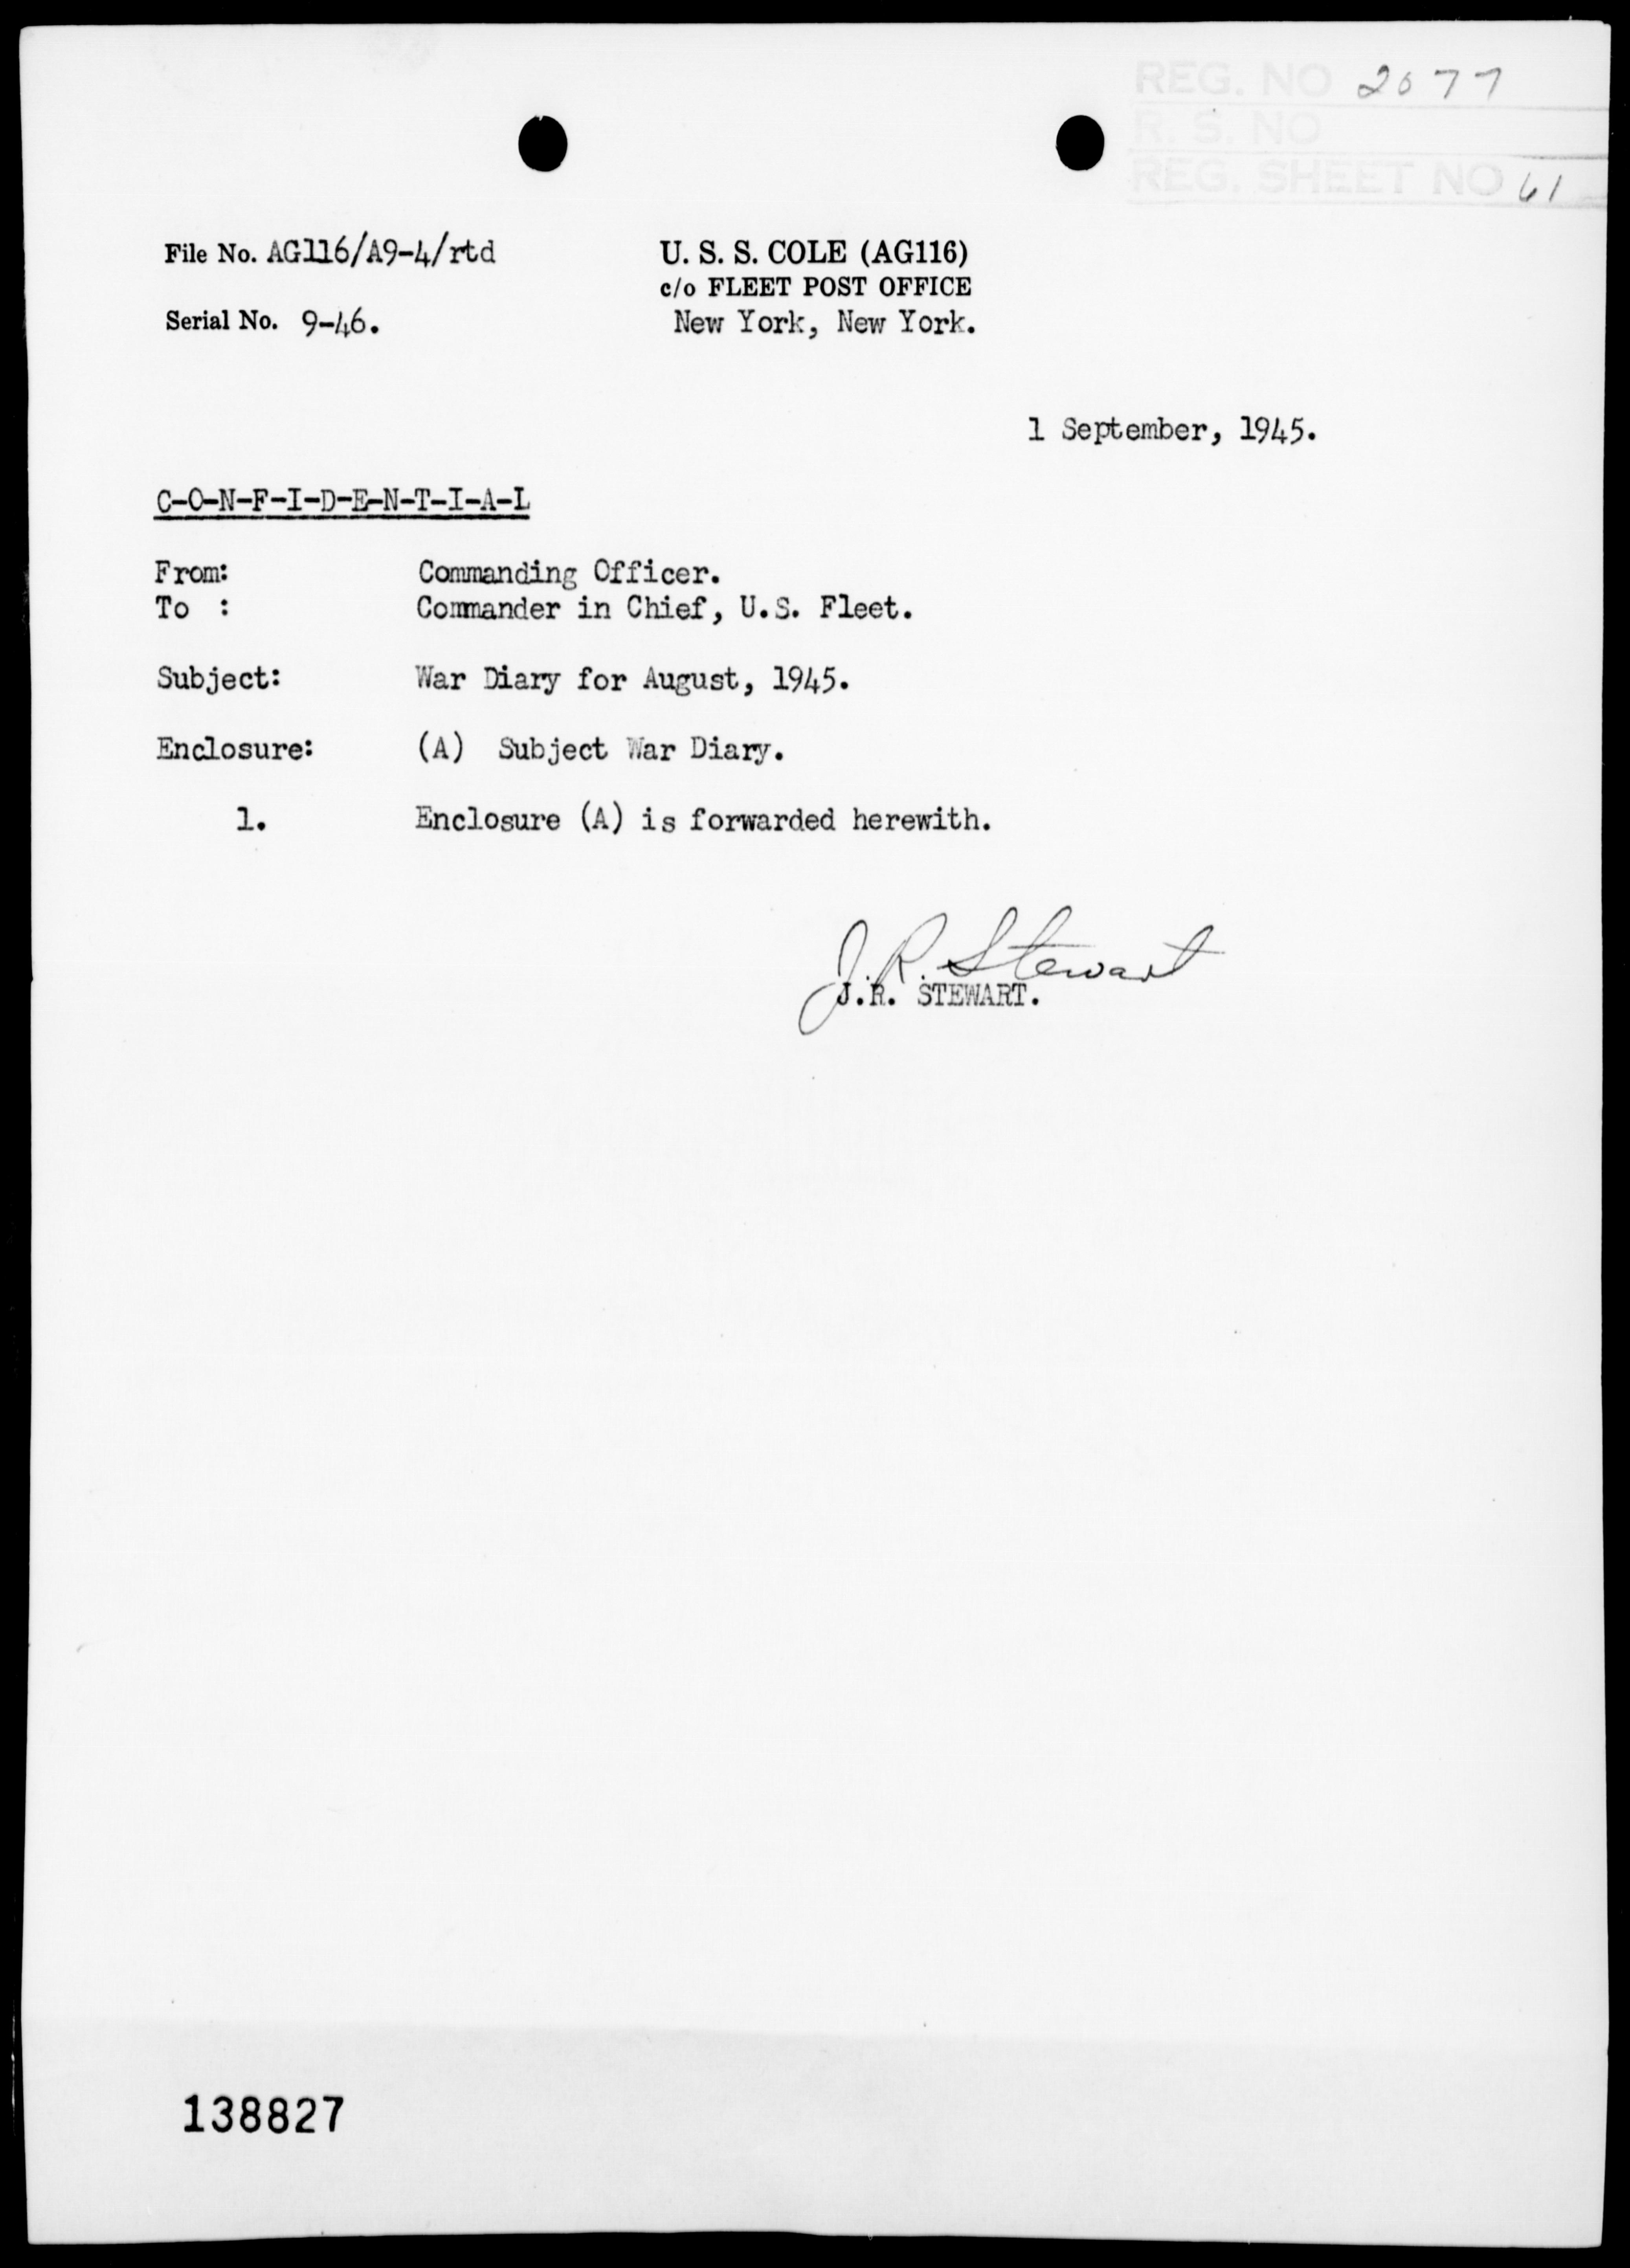 USS COLE - War Diary, 8/1-31/45